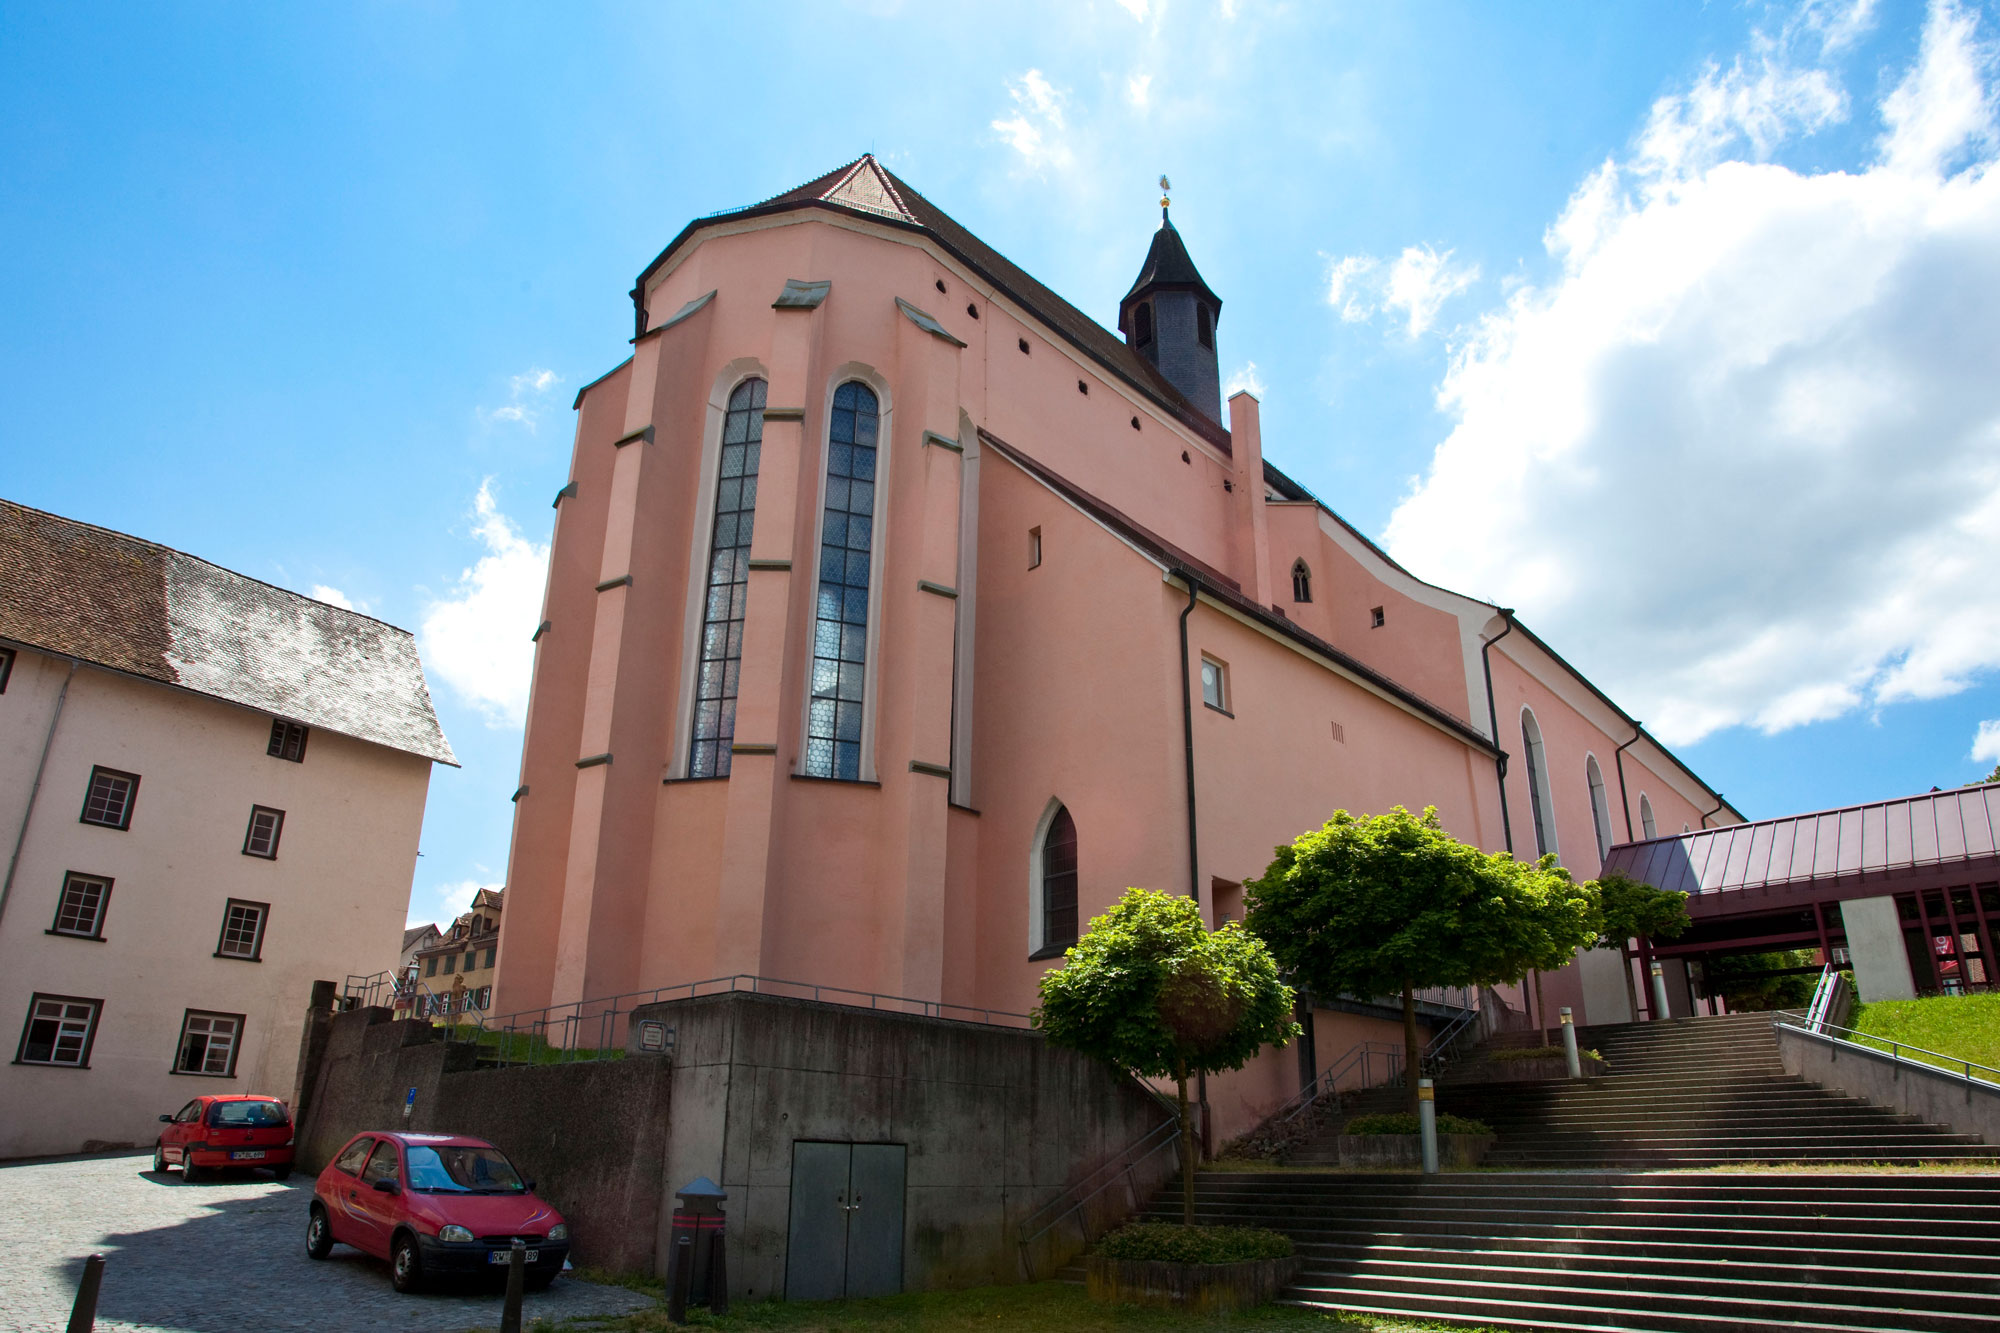 Blick vom Bockshof auf die Predigerkirche